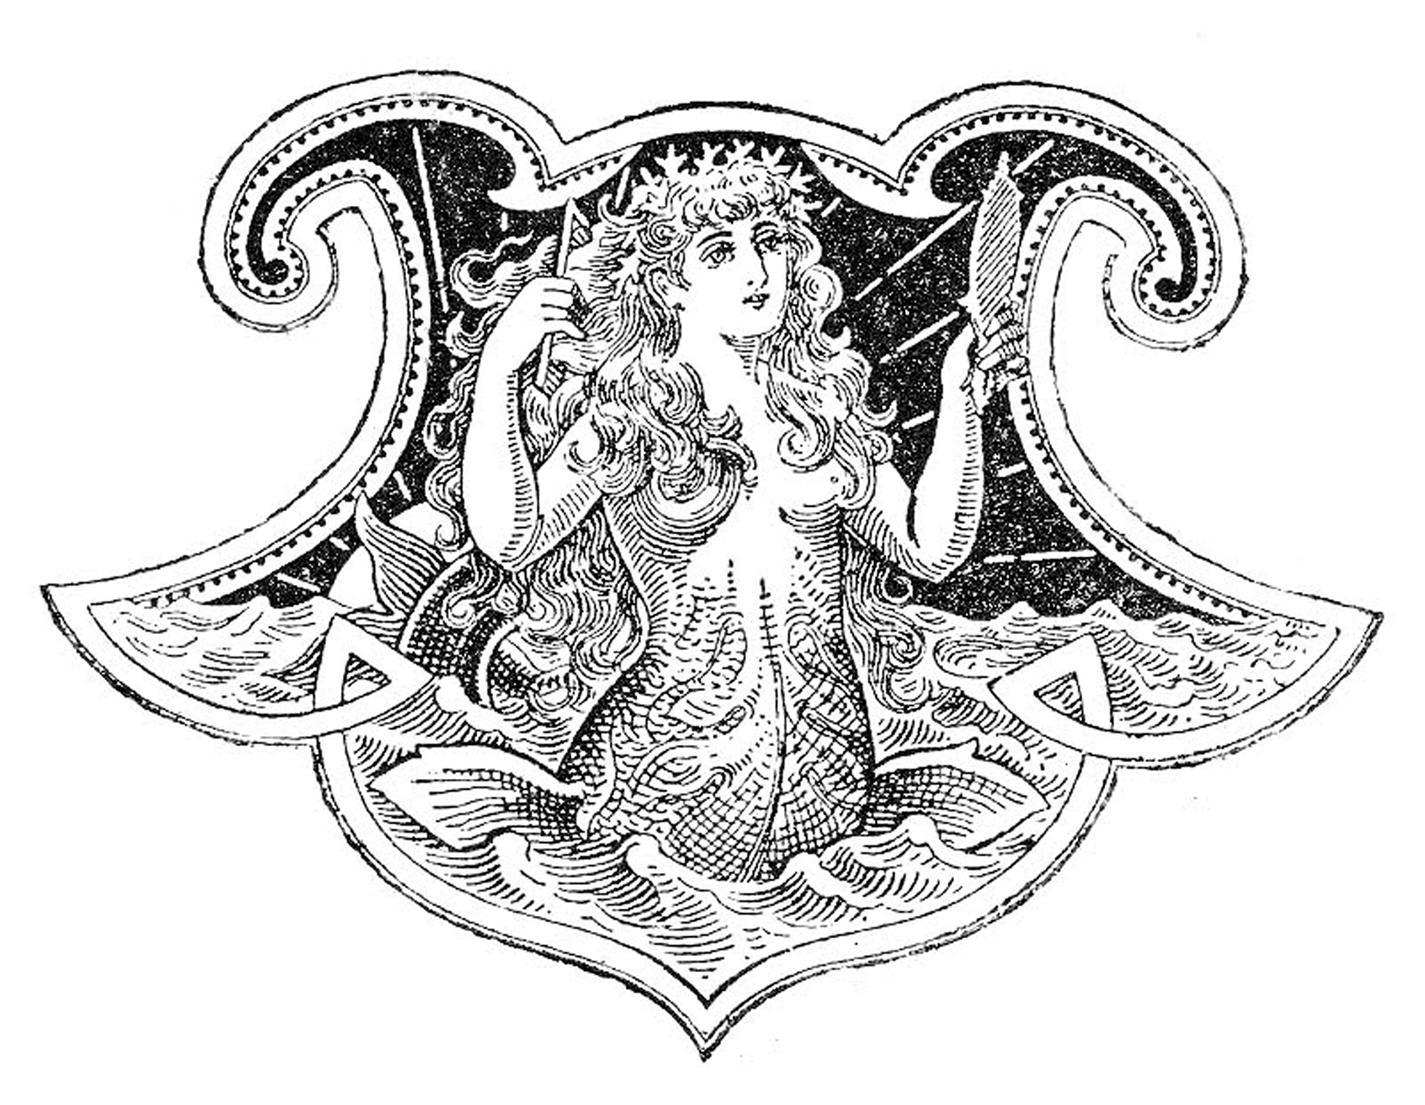 clip art images. Mermaid clipart victorian